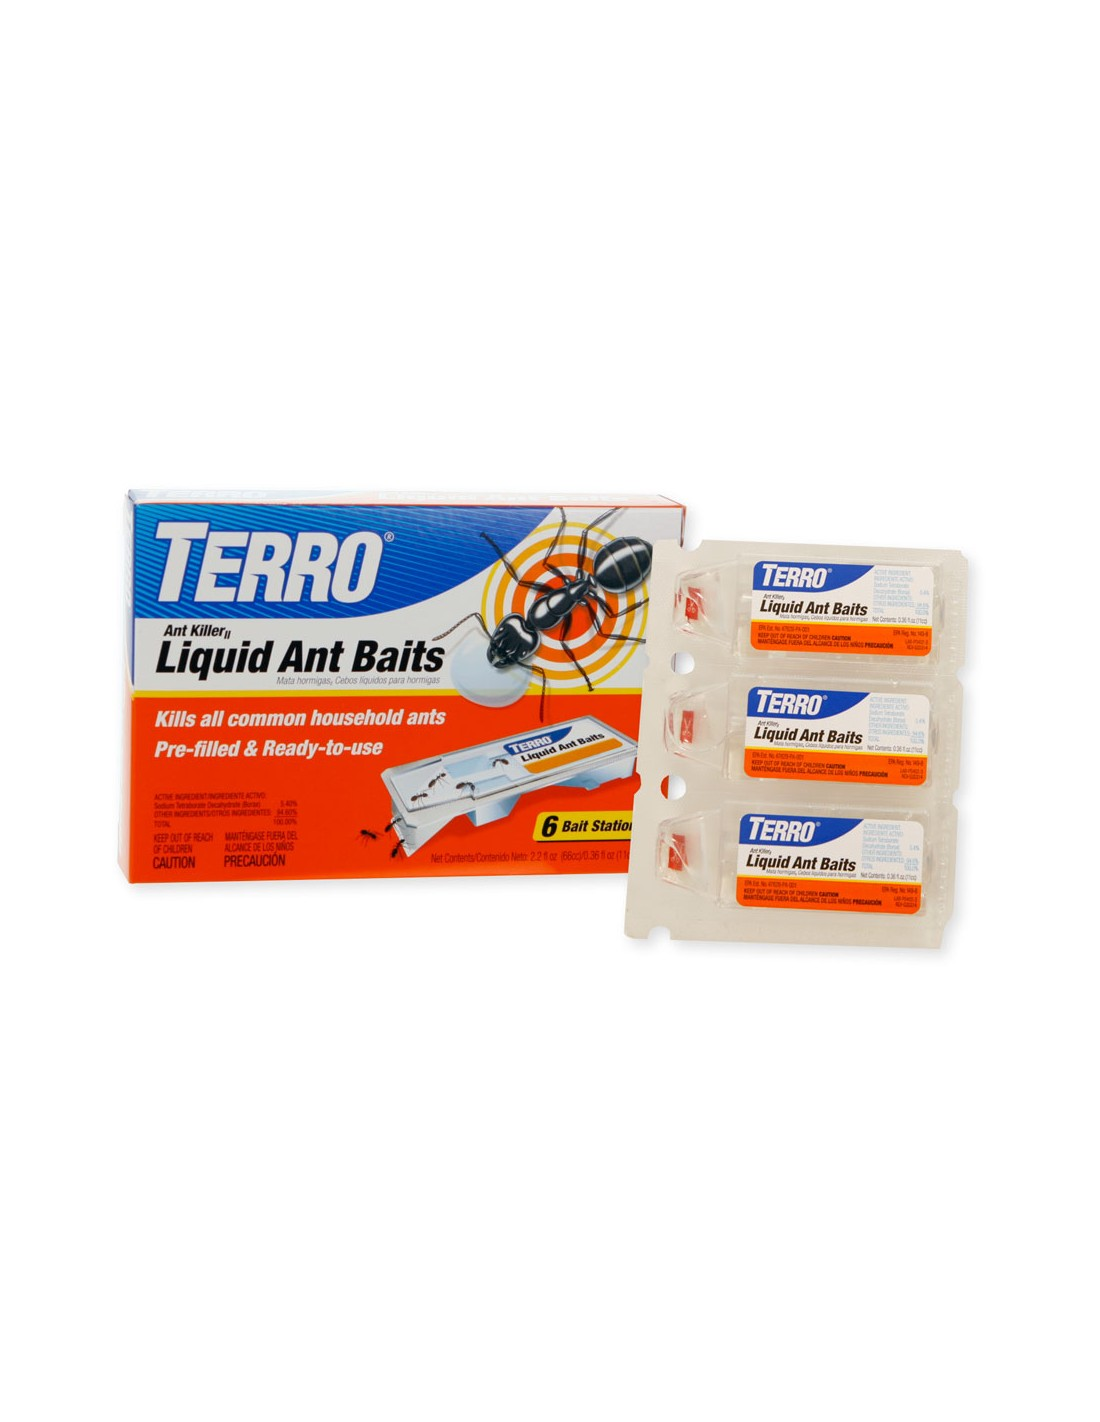 Terro Liquid Ant Bait Questions & Answers